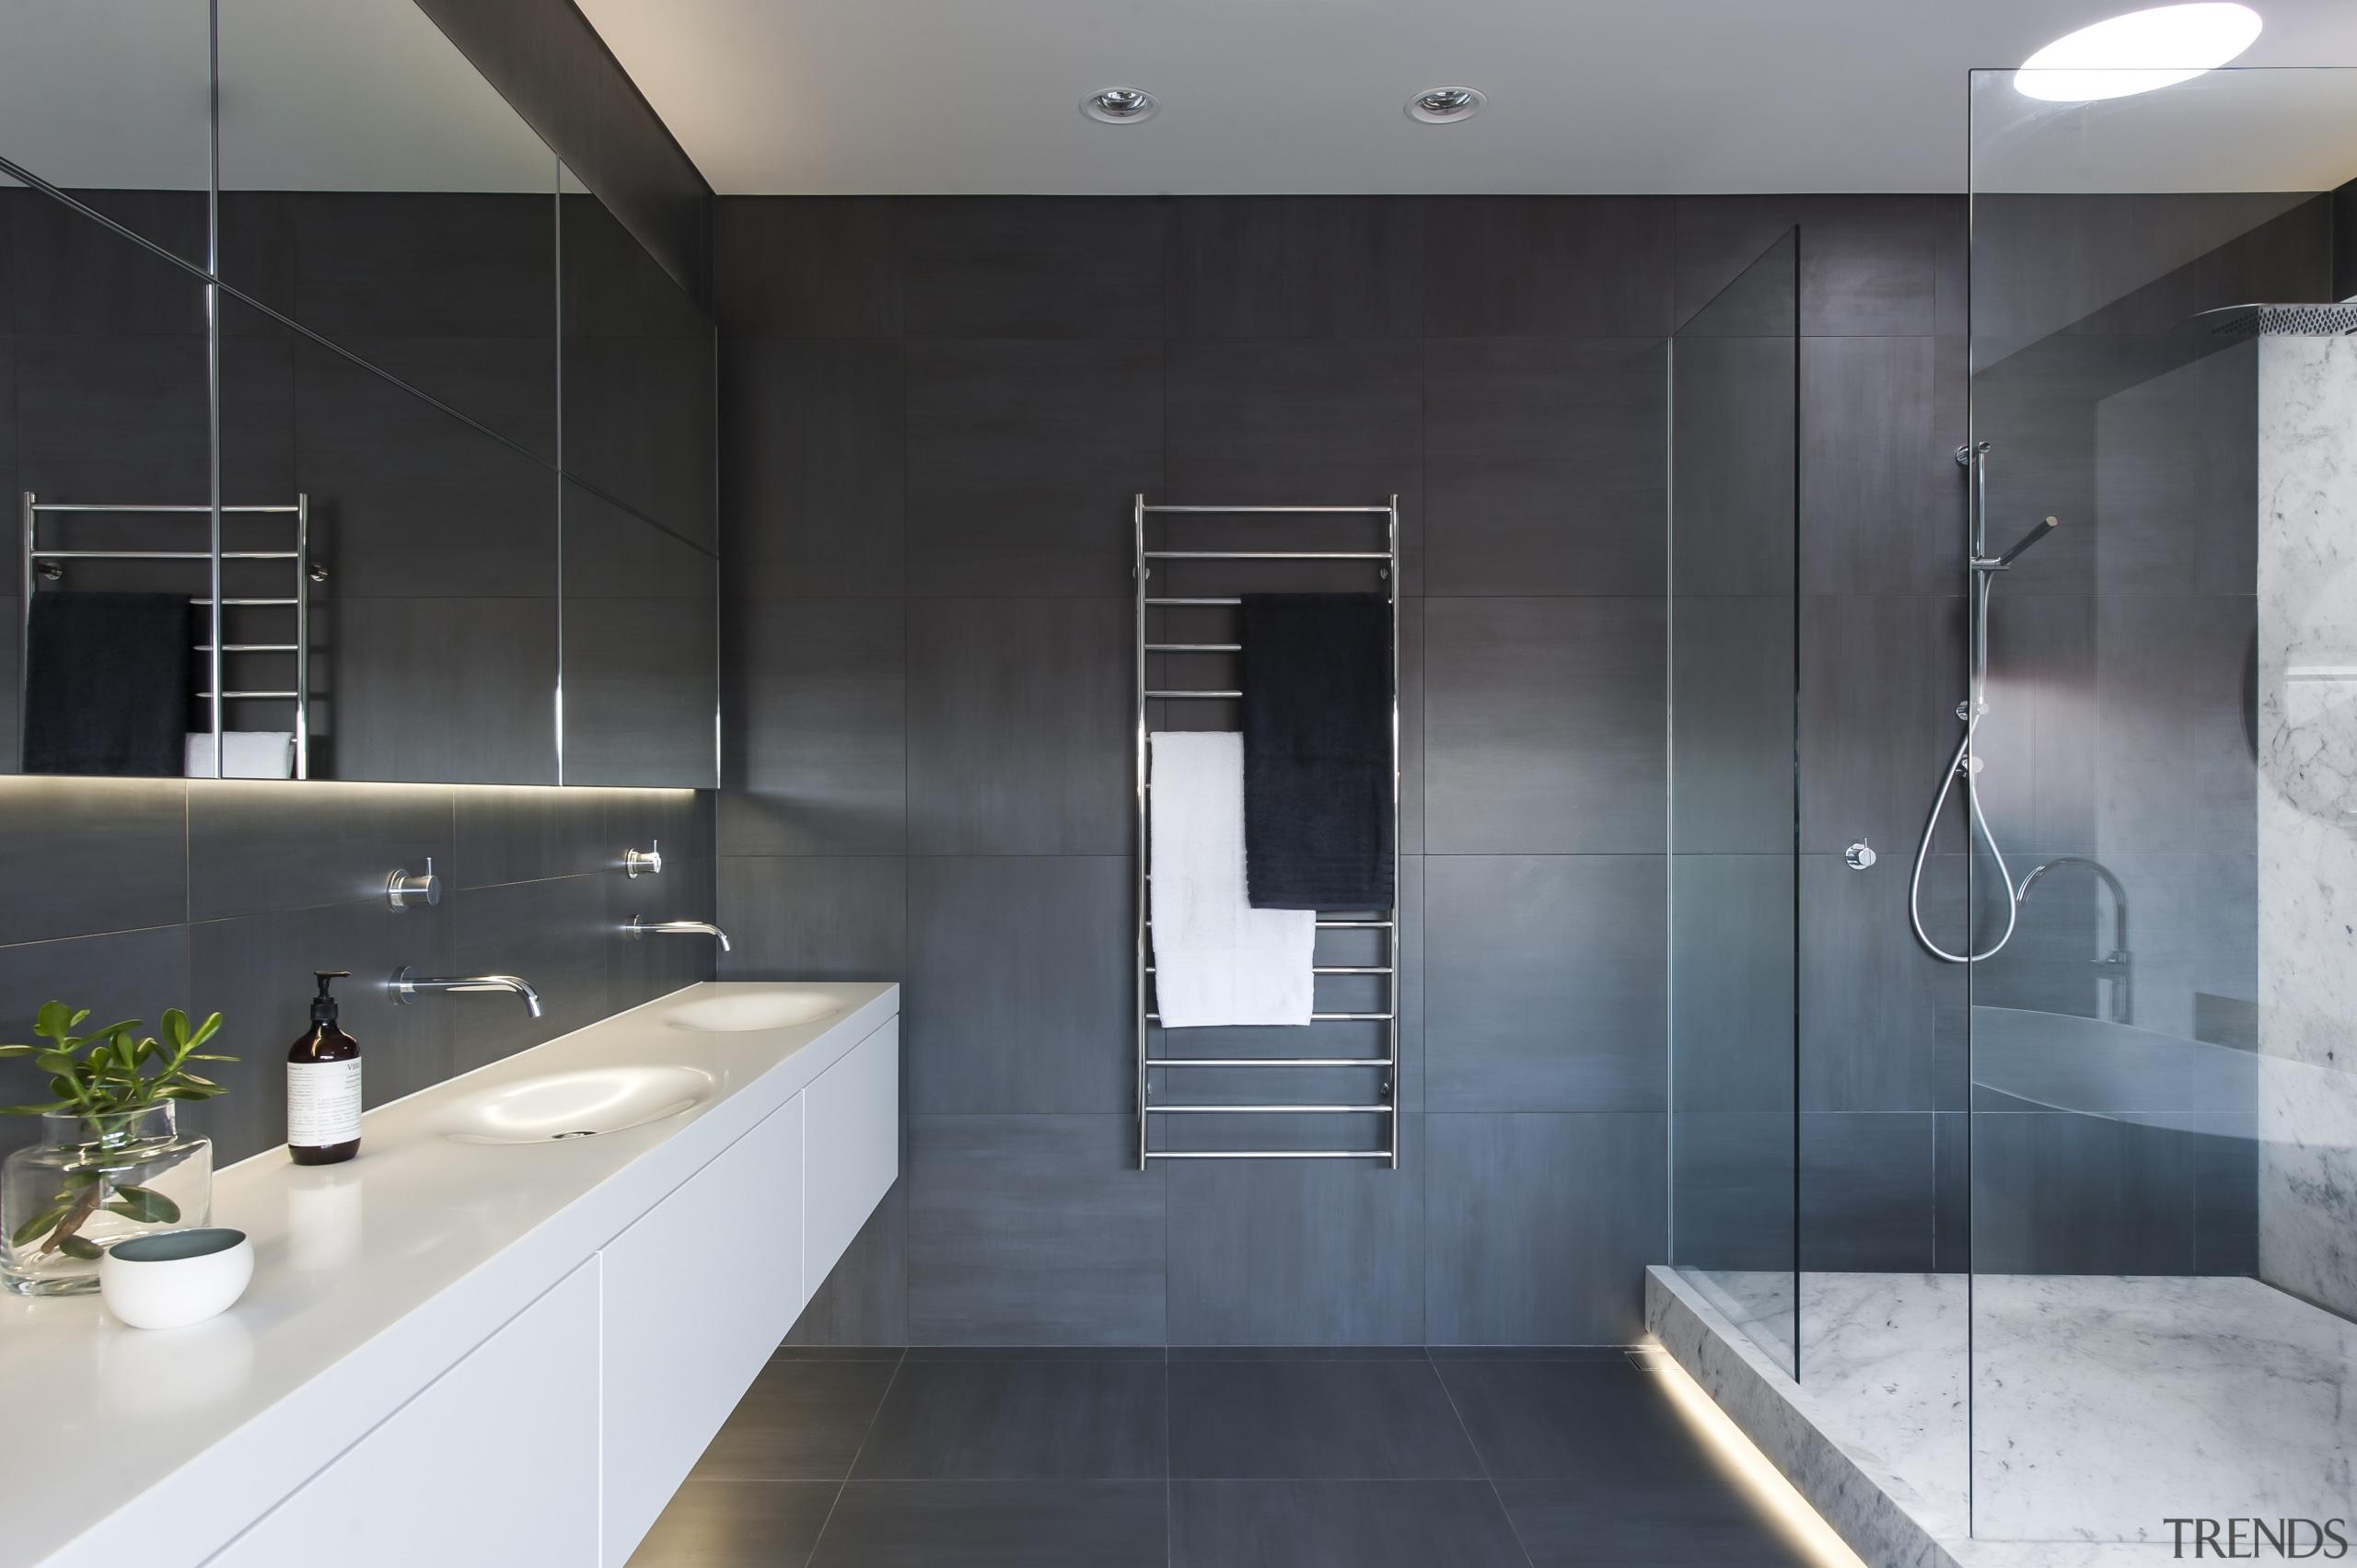 The double vanity in this bathroom is hand architecture, bathroom, countertop, floor, interior design, room, tile, black, gray